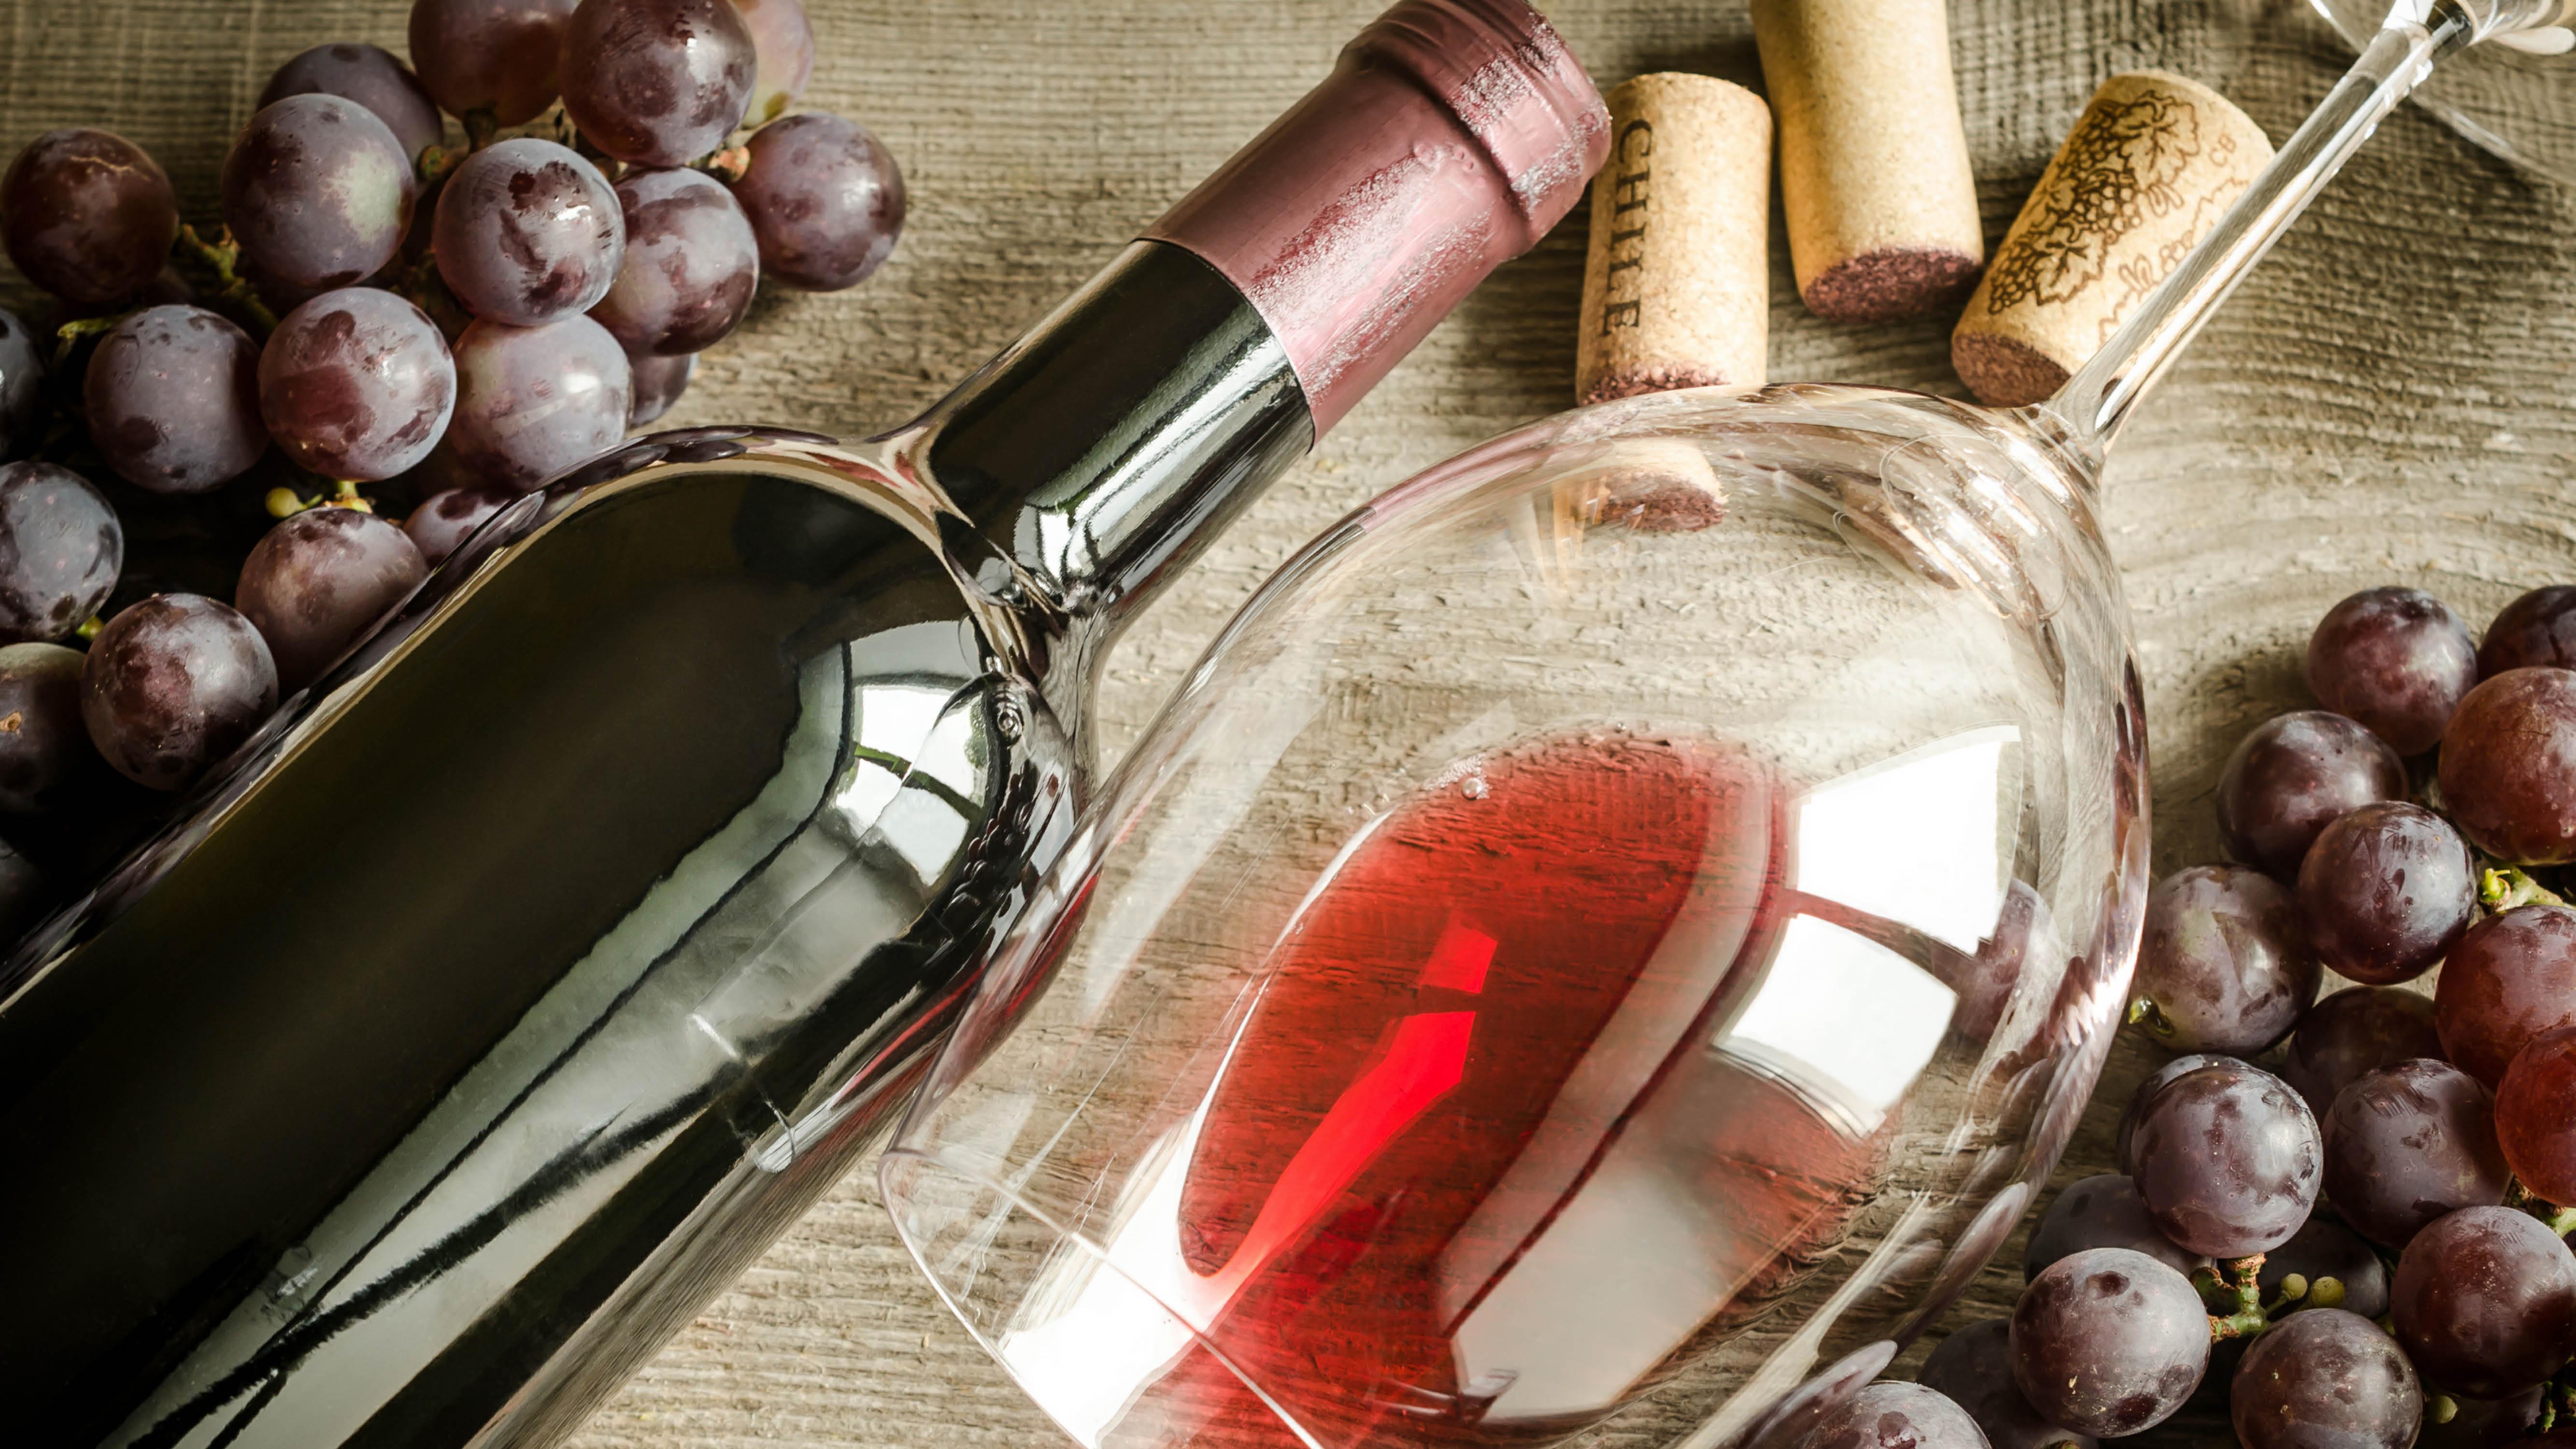 wine-flat-lay-bottle-glass-grapes.jpg